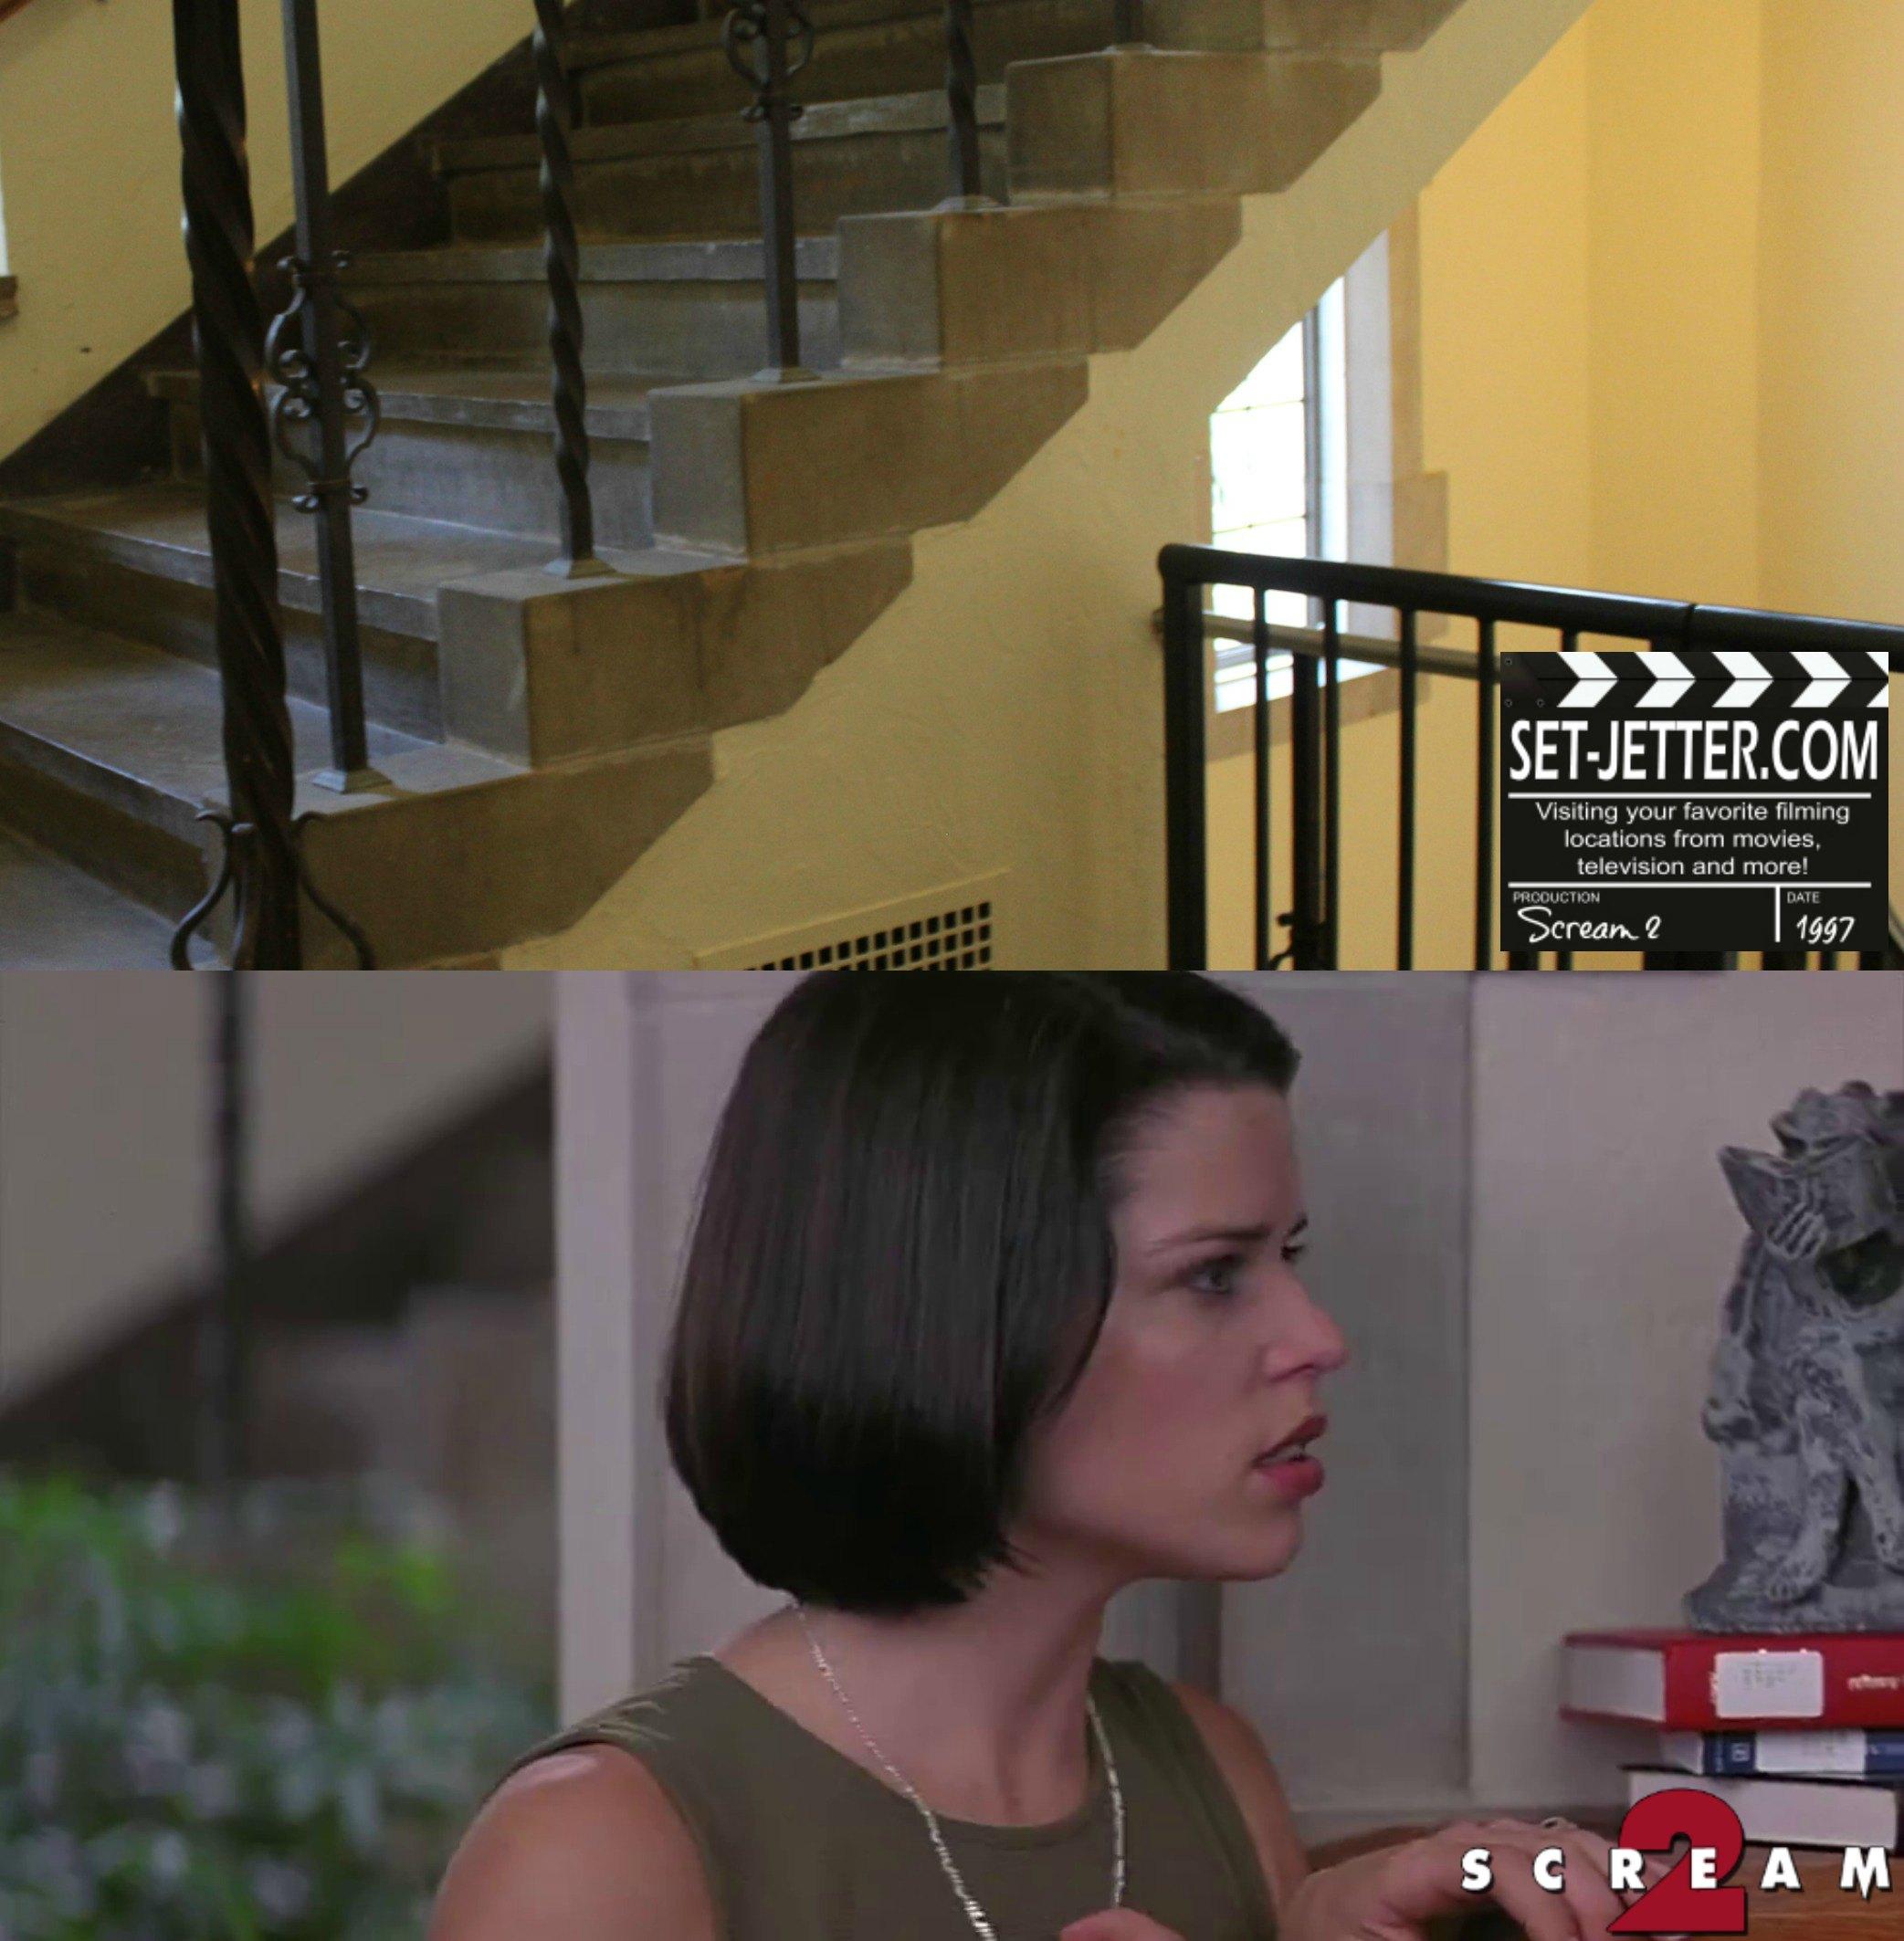 Scream 2 comparison 188.jpg